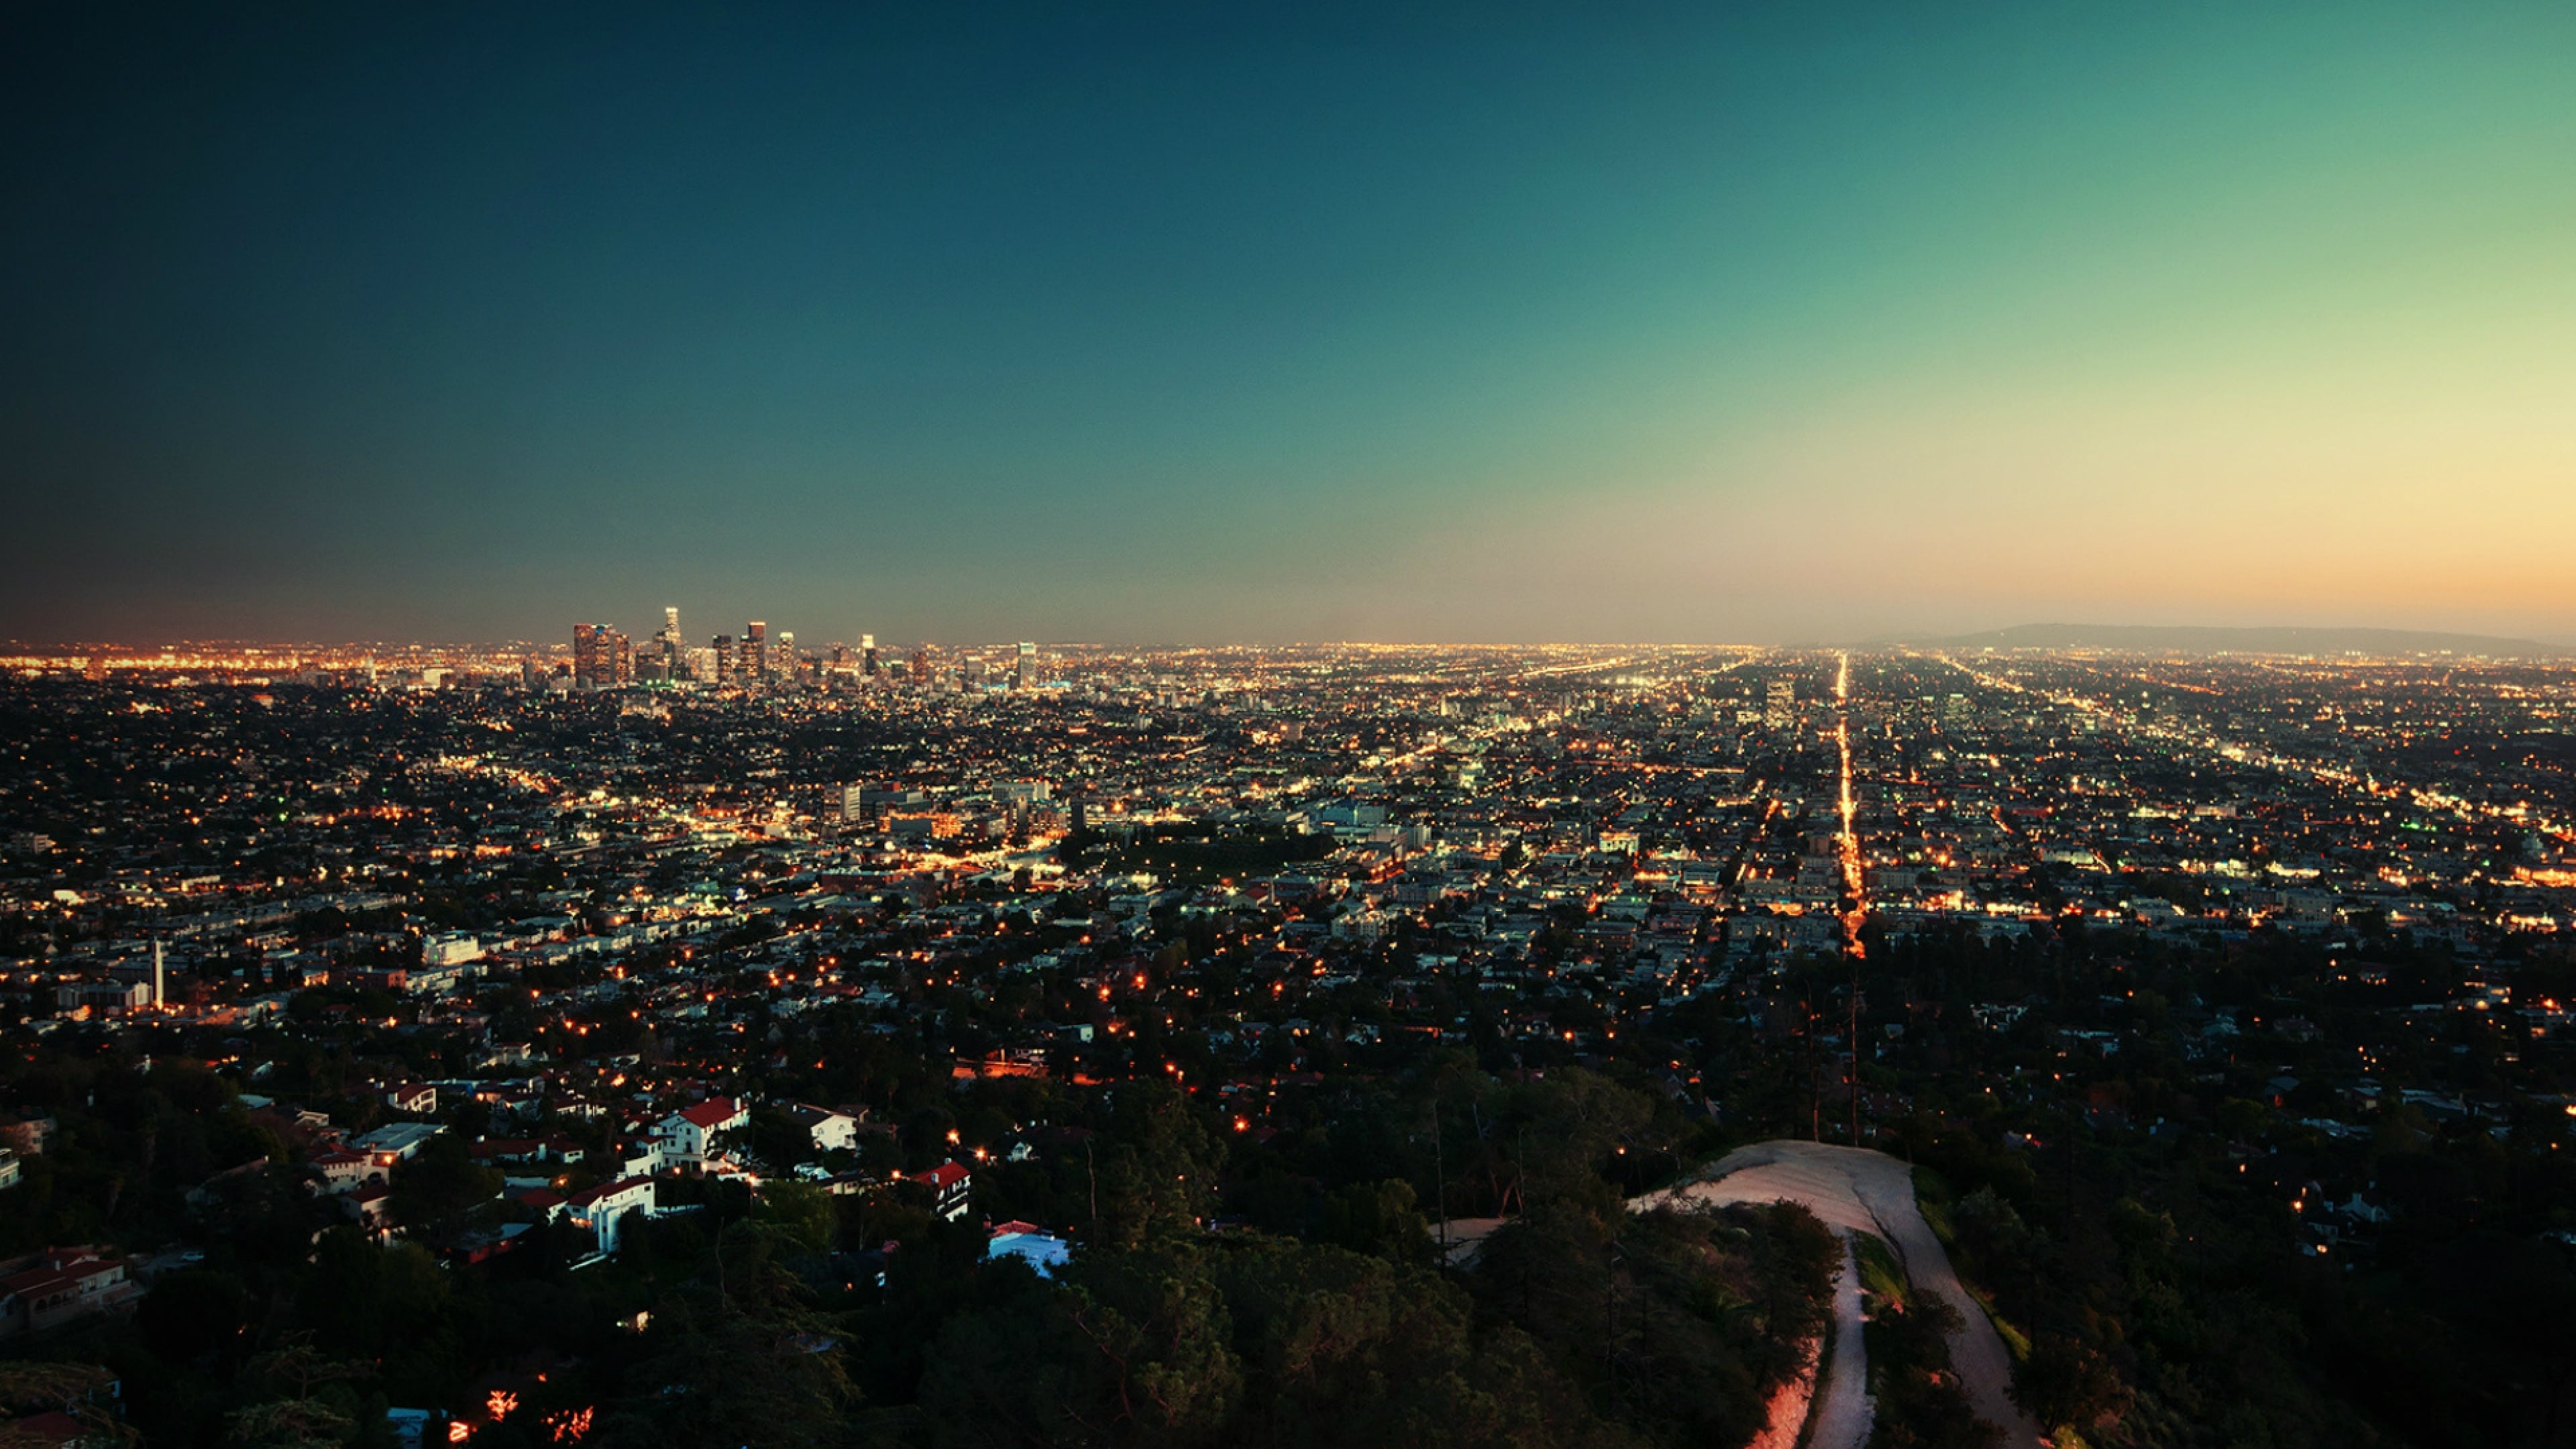 Los Angeles Background